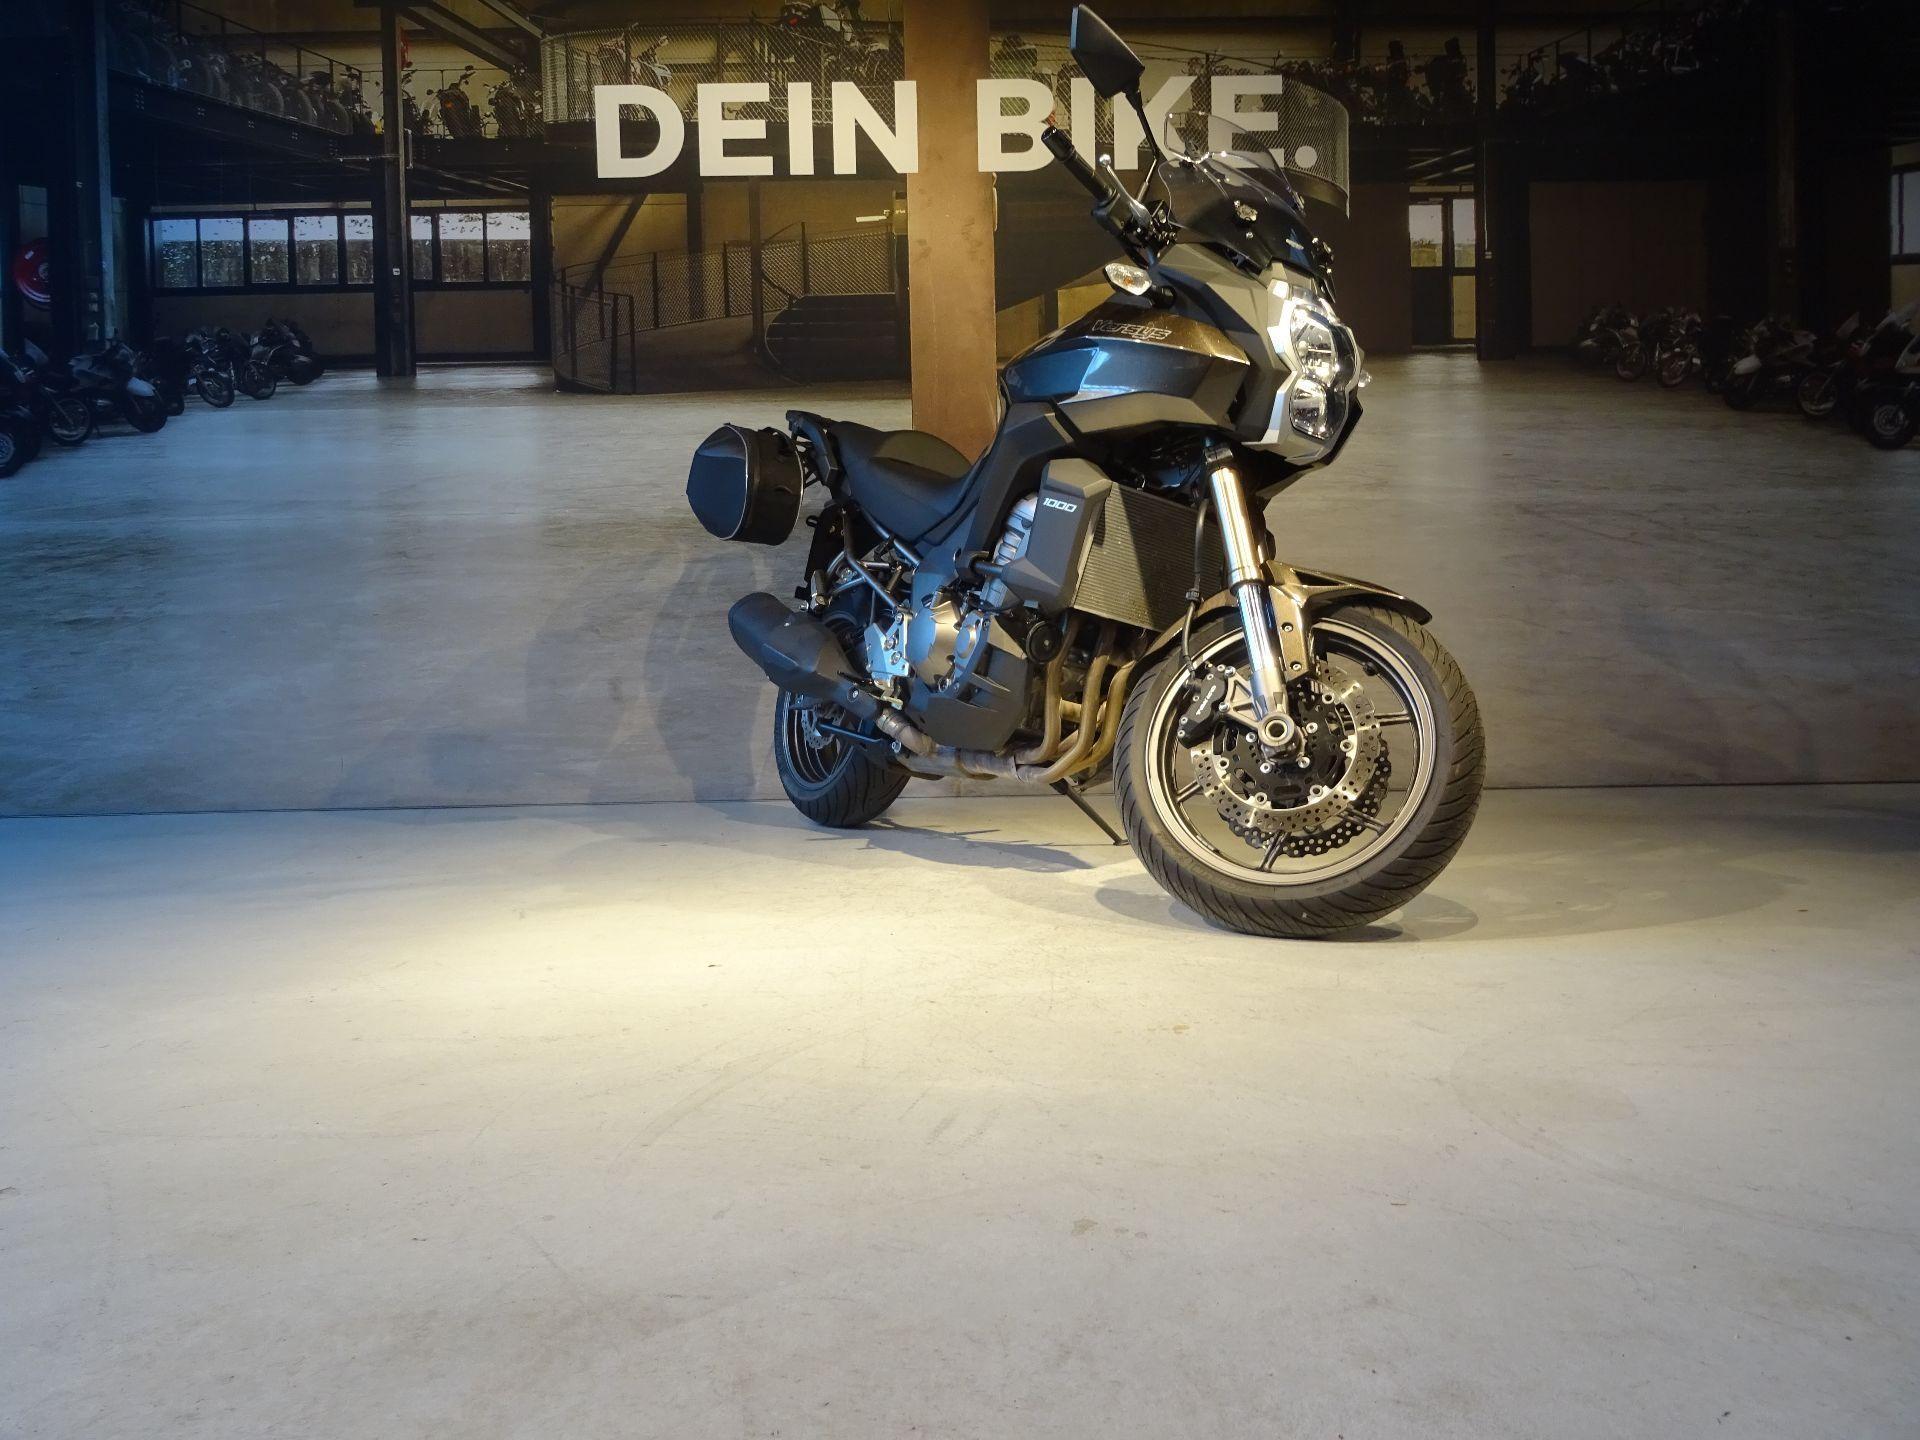 moto occasions acheter kawasaki versys 1000 abs hess motorrad stettlen. Black Bedroom Furniture Sets. Home Design Ideas